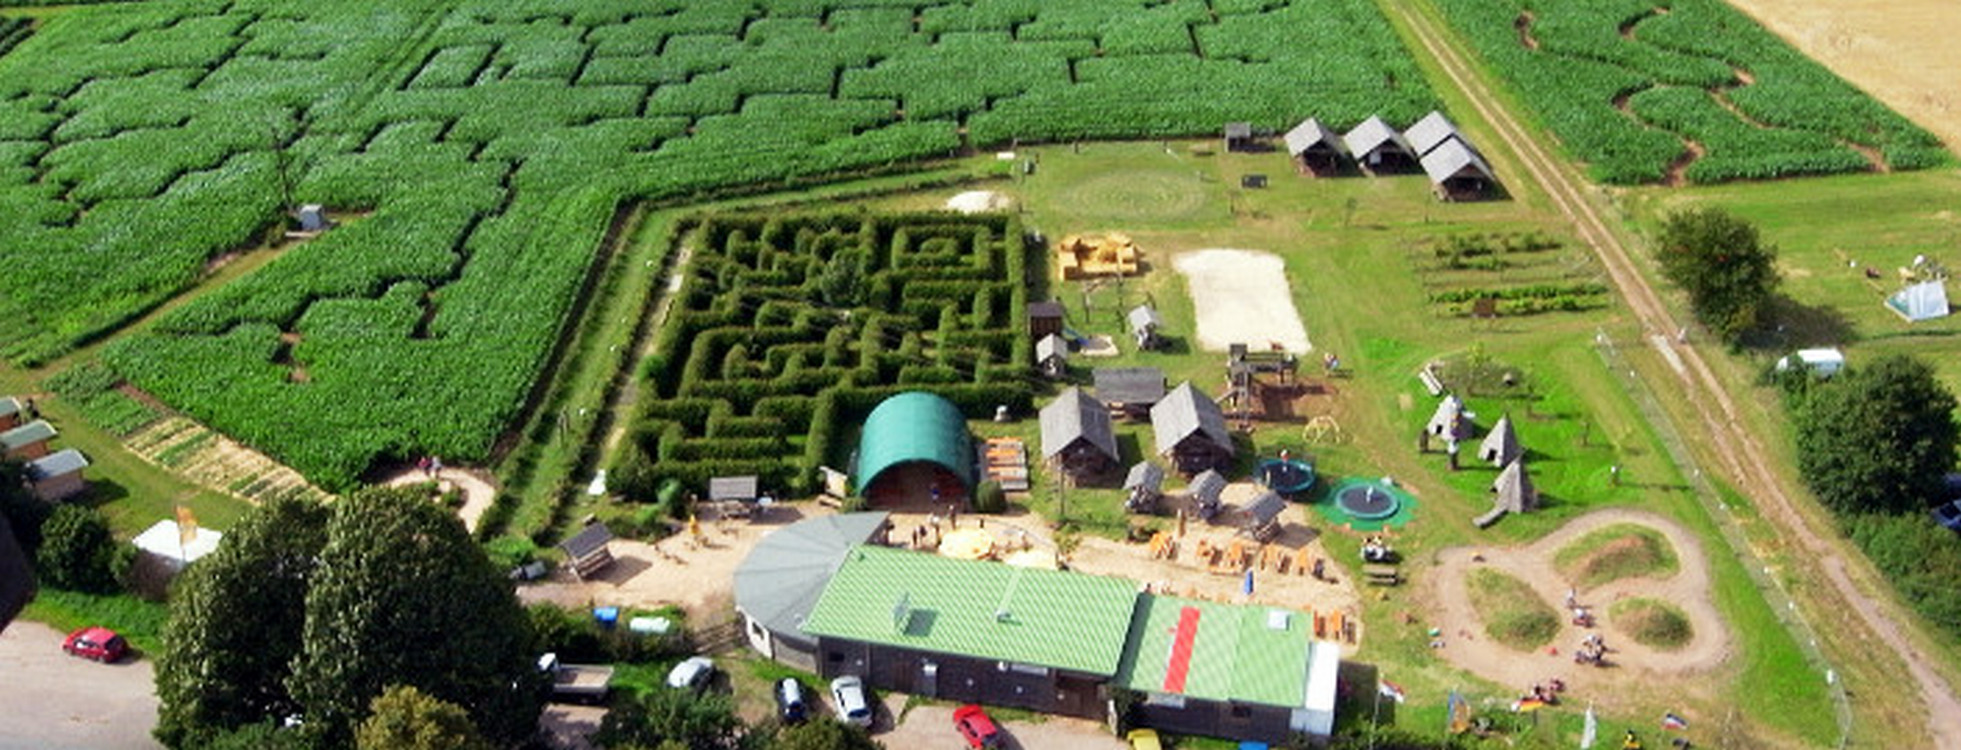 Maislabyrinth Nrw